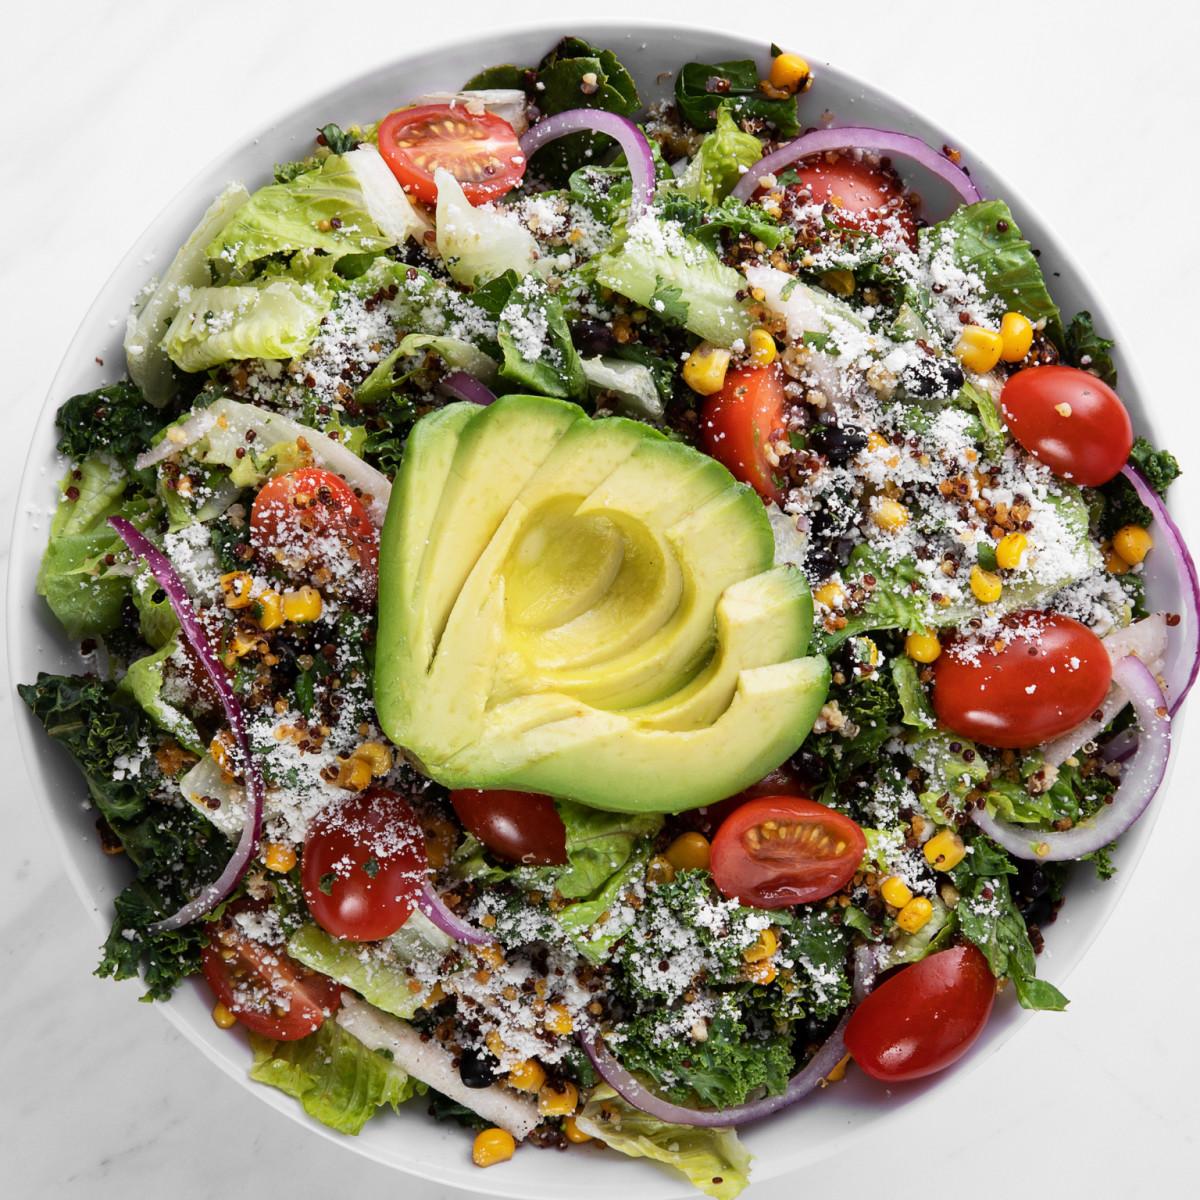 Mendocino Farms avocado and quinoa superfood ensalada